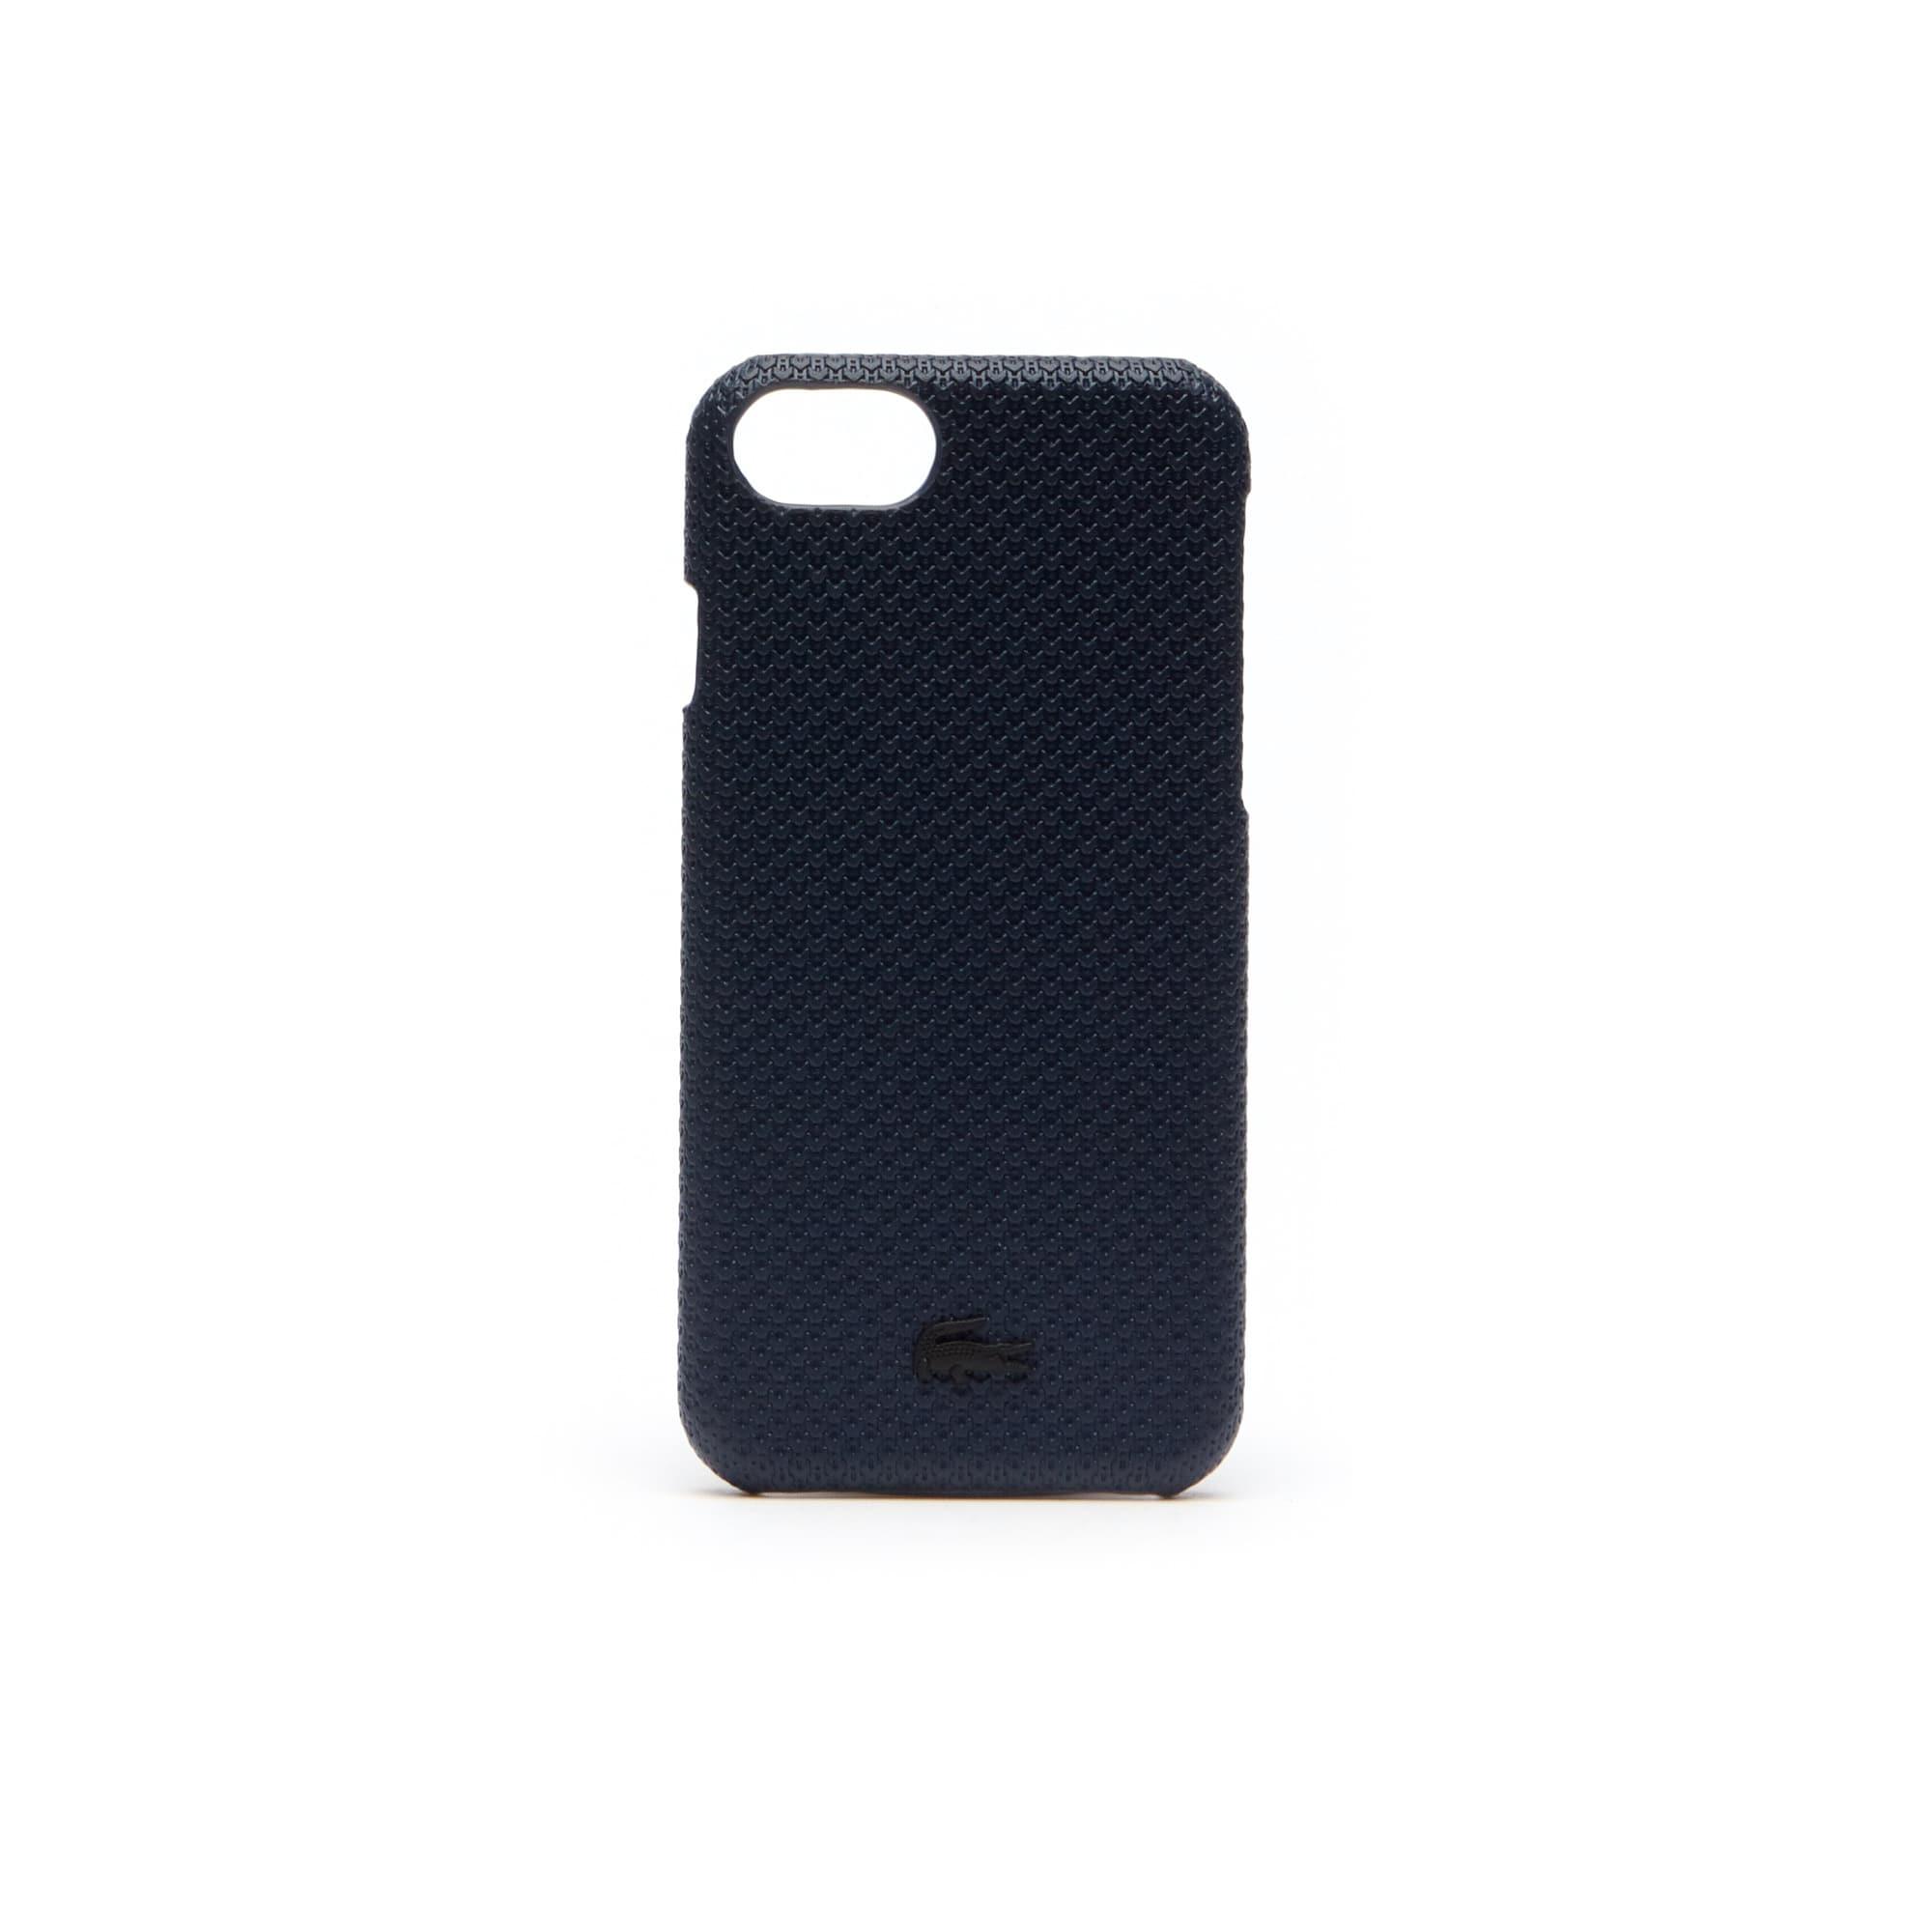 Herren CHANTACO iPhone 8 Hülle aus Piqué-Leder